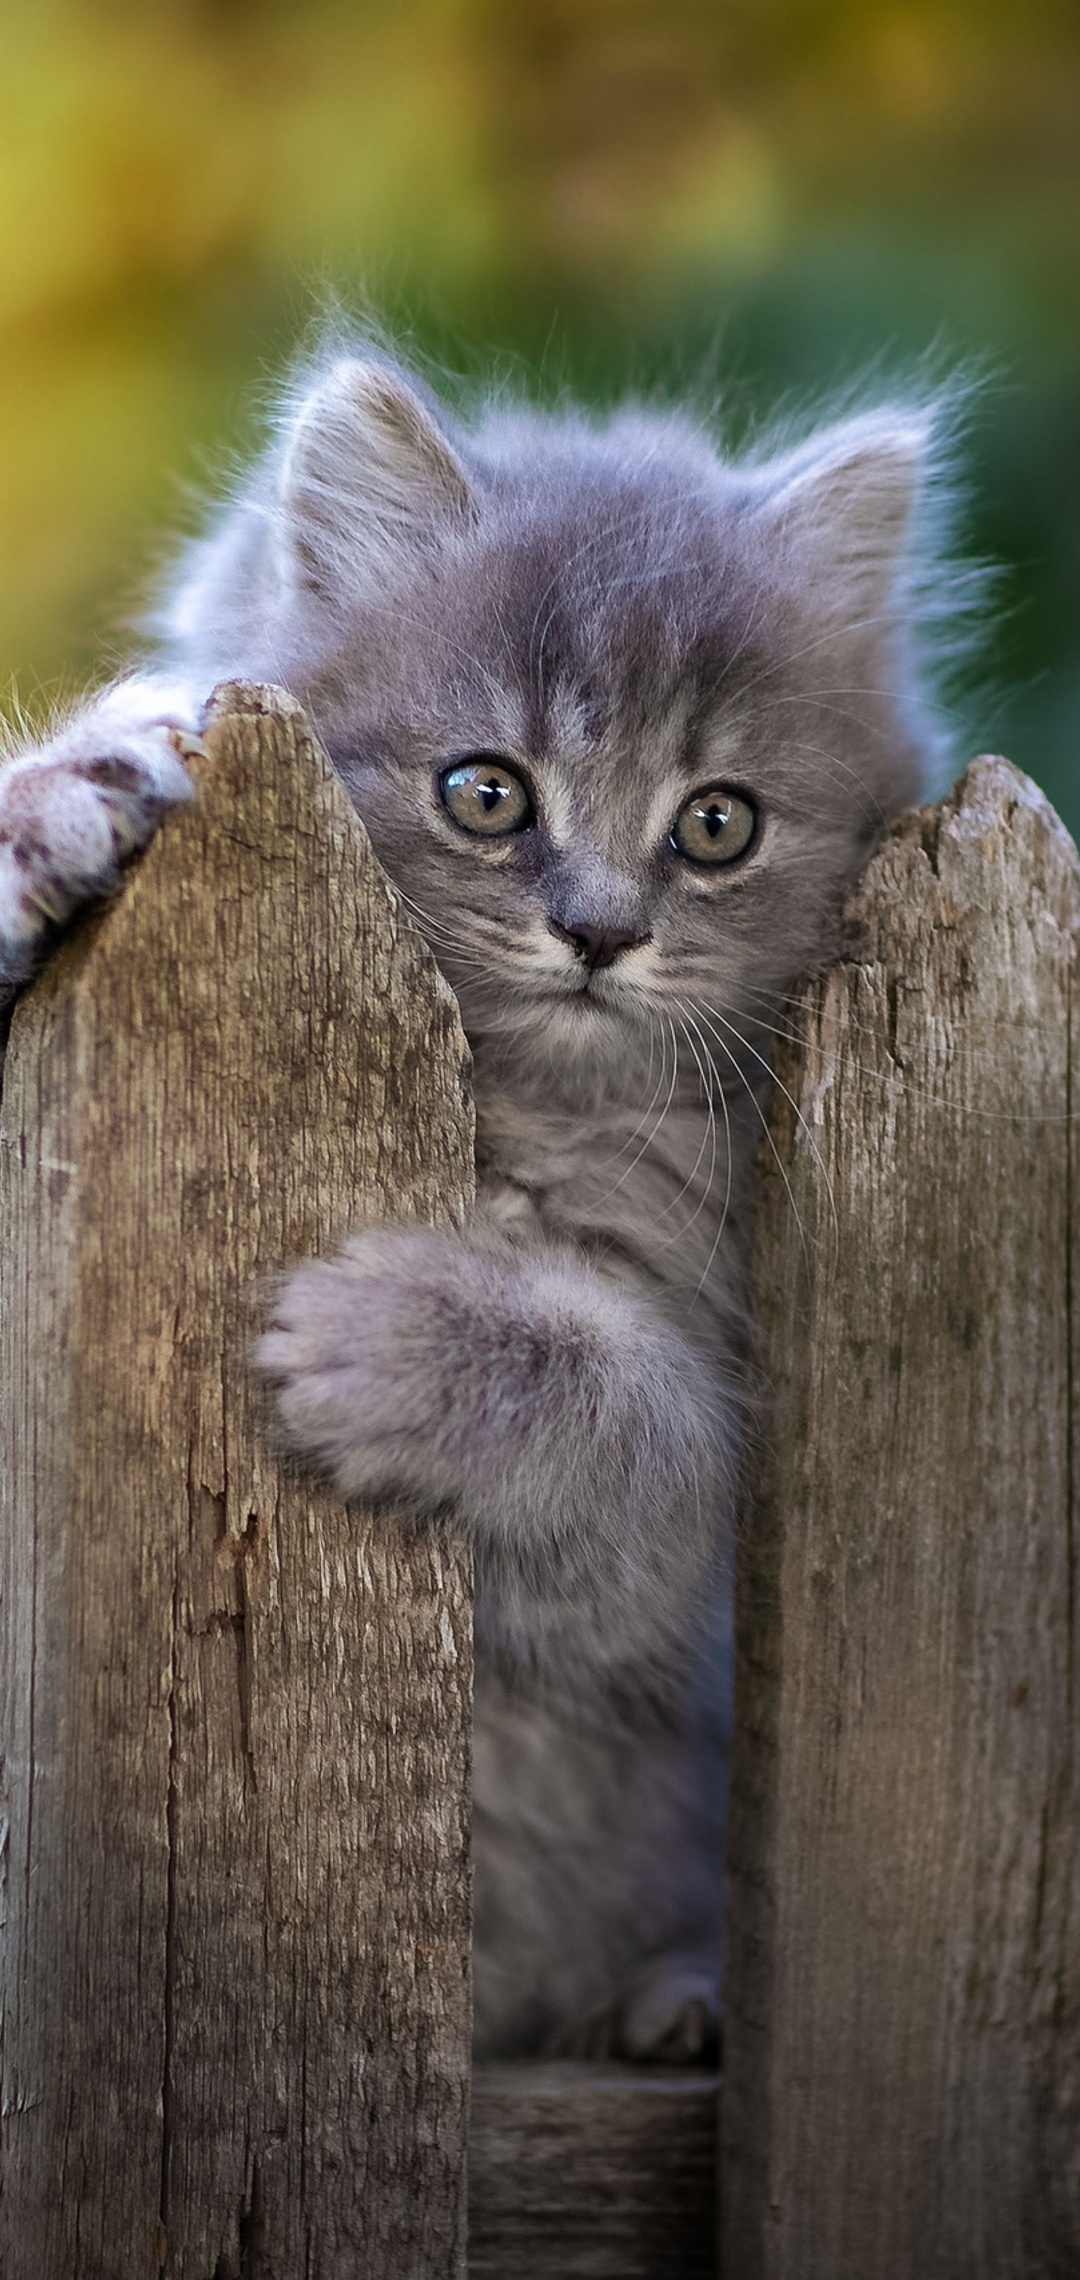 cat-fence-pawn-44.jpg